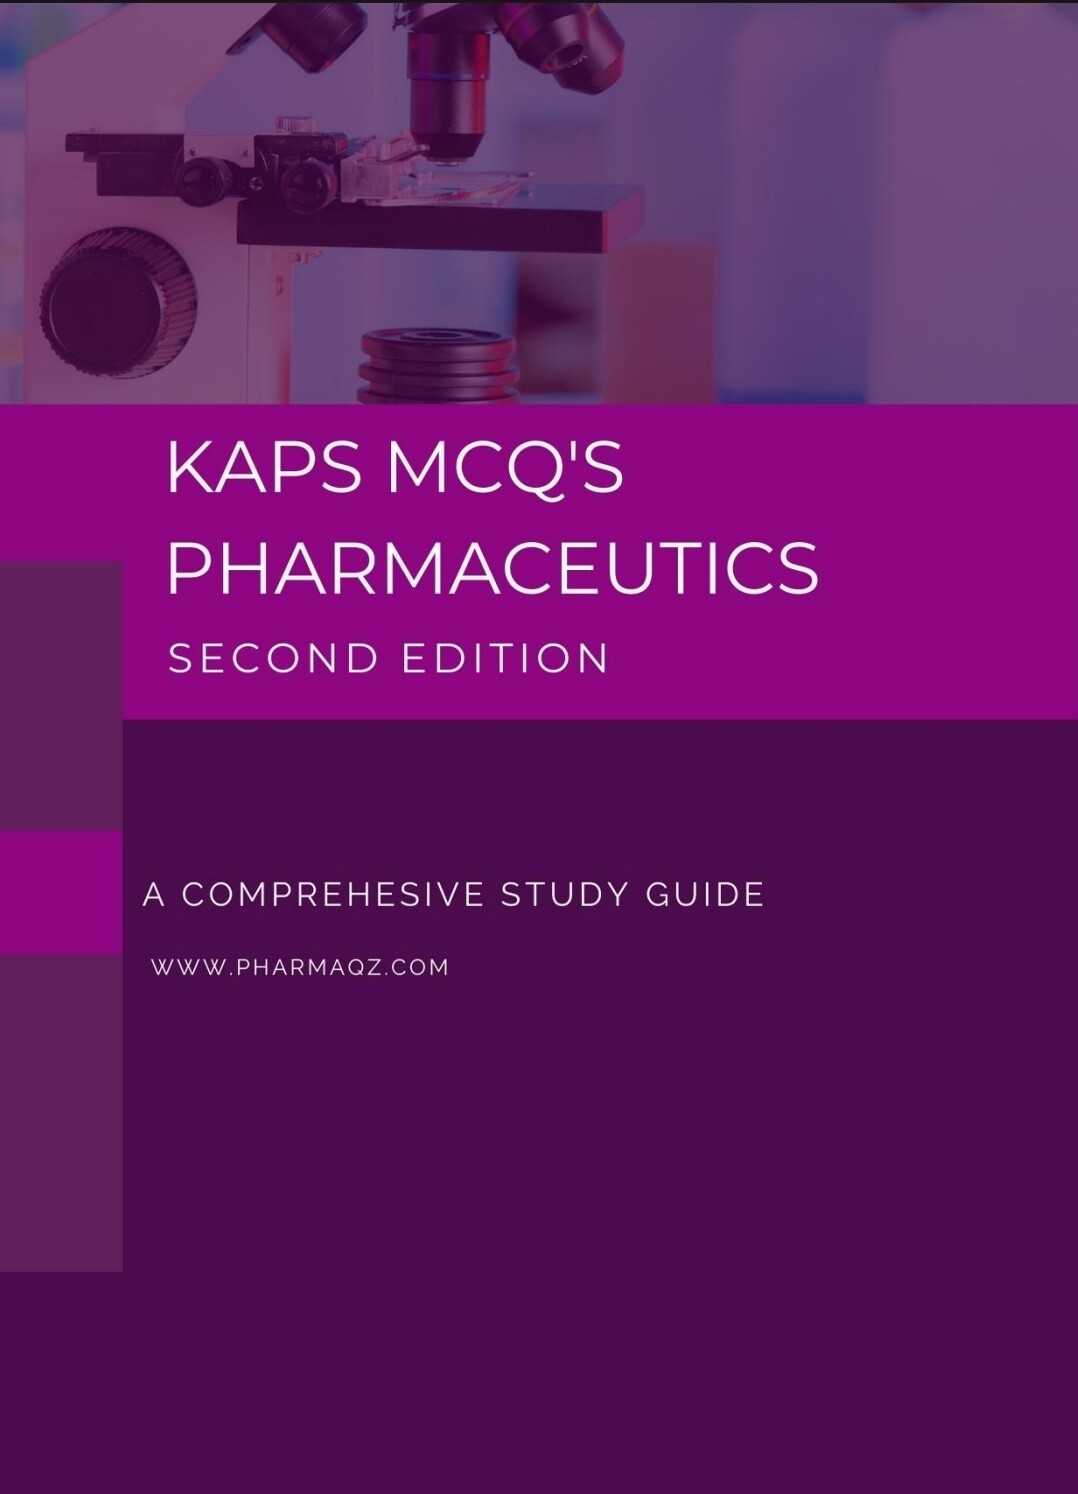 KAPS PHARMACEUTICS 2ND EDITION